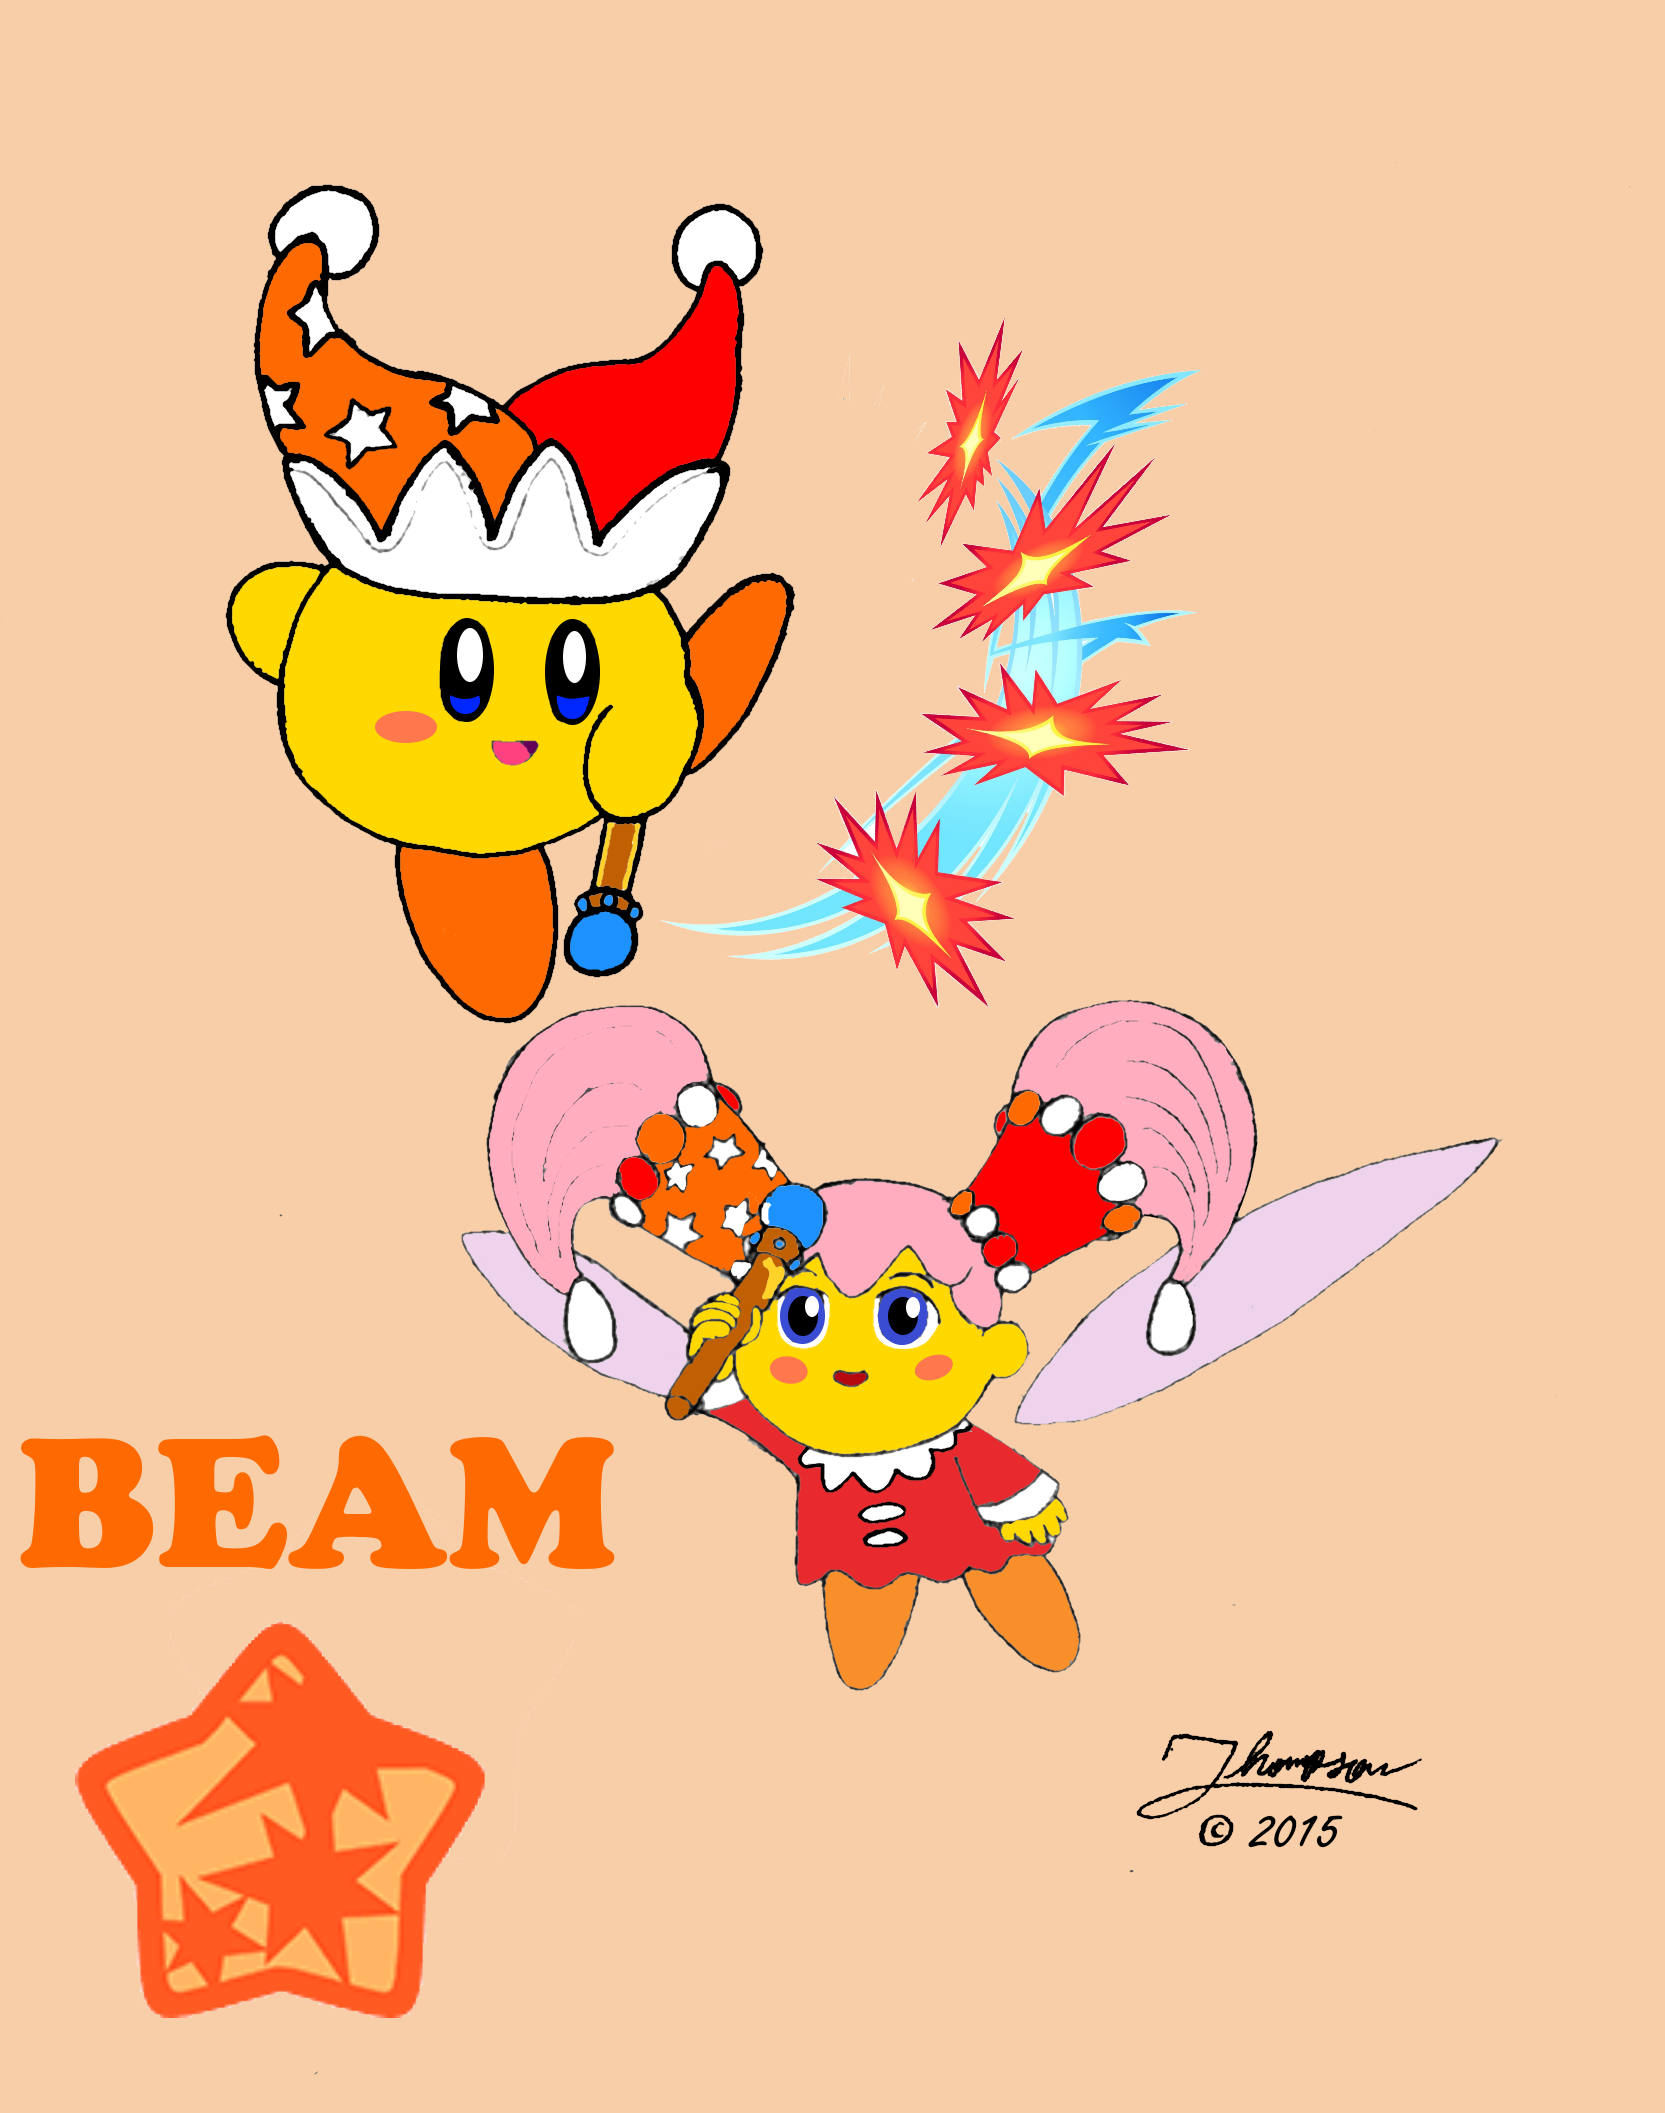 Beam Ability